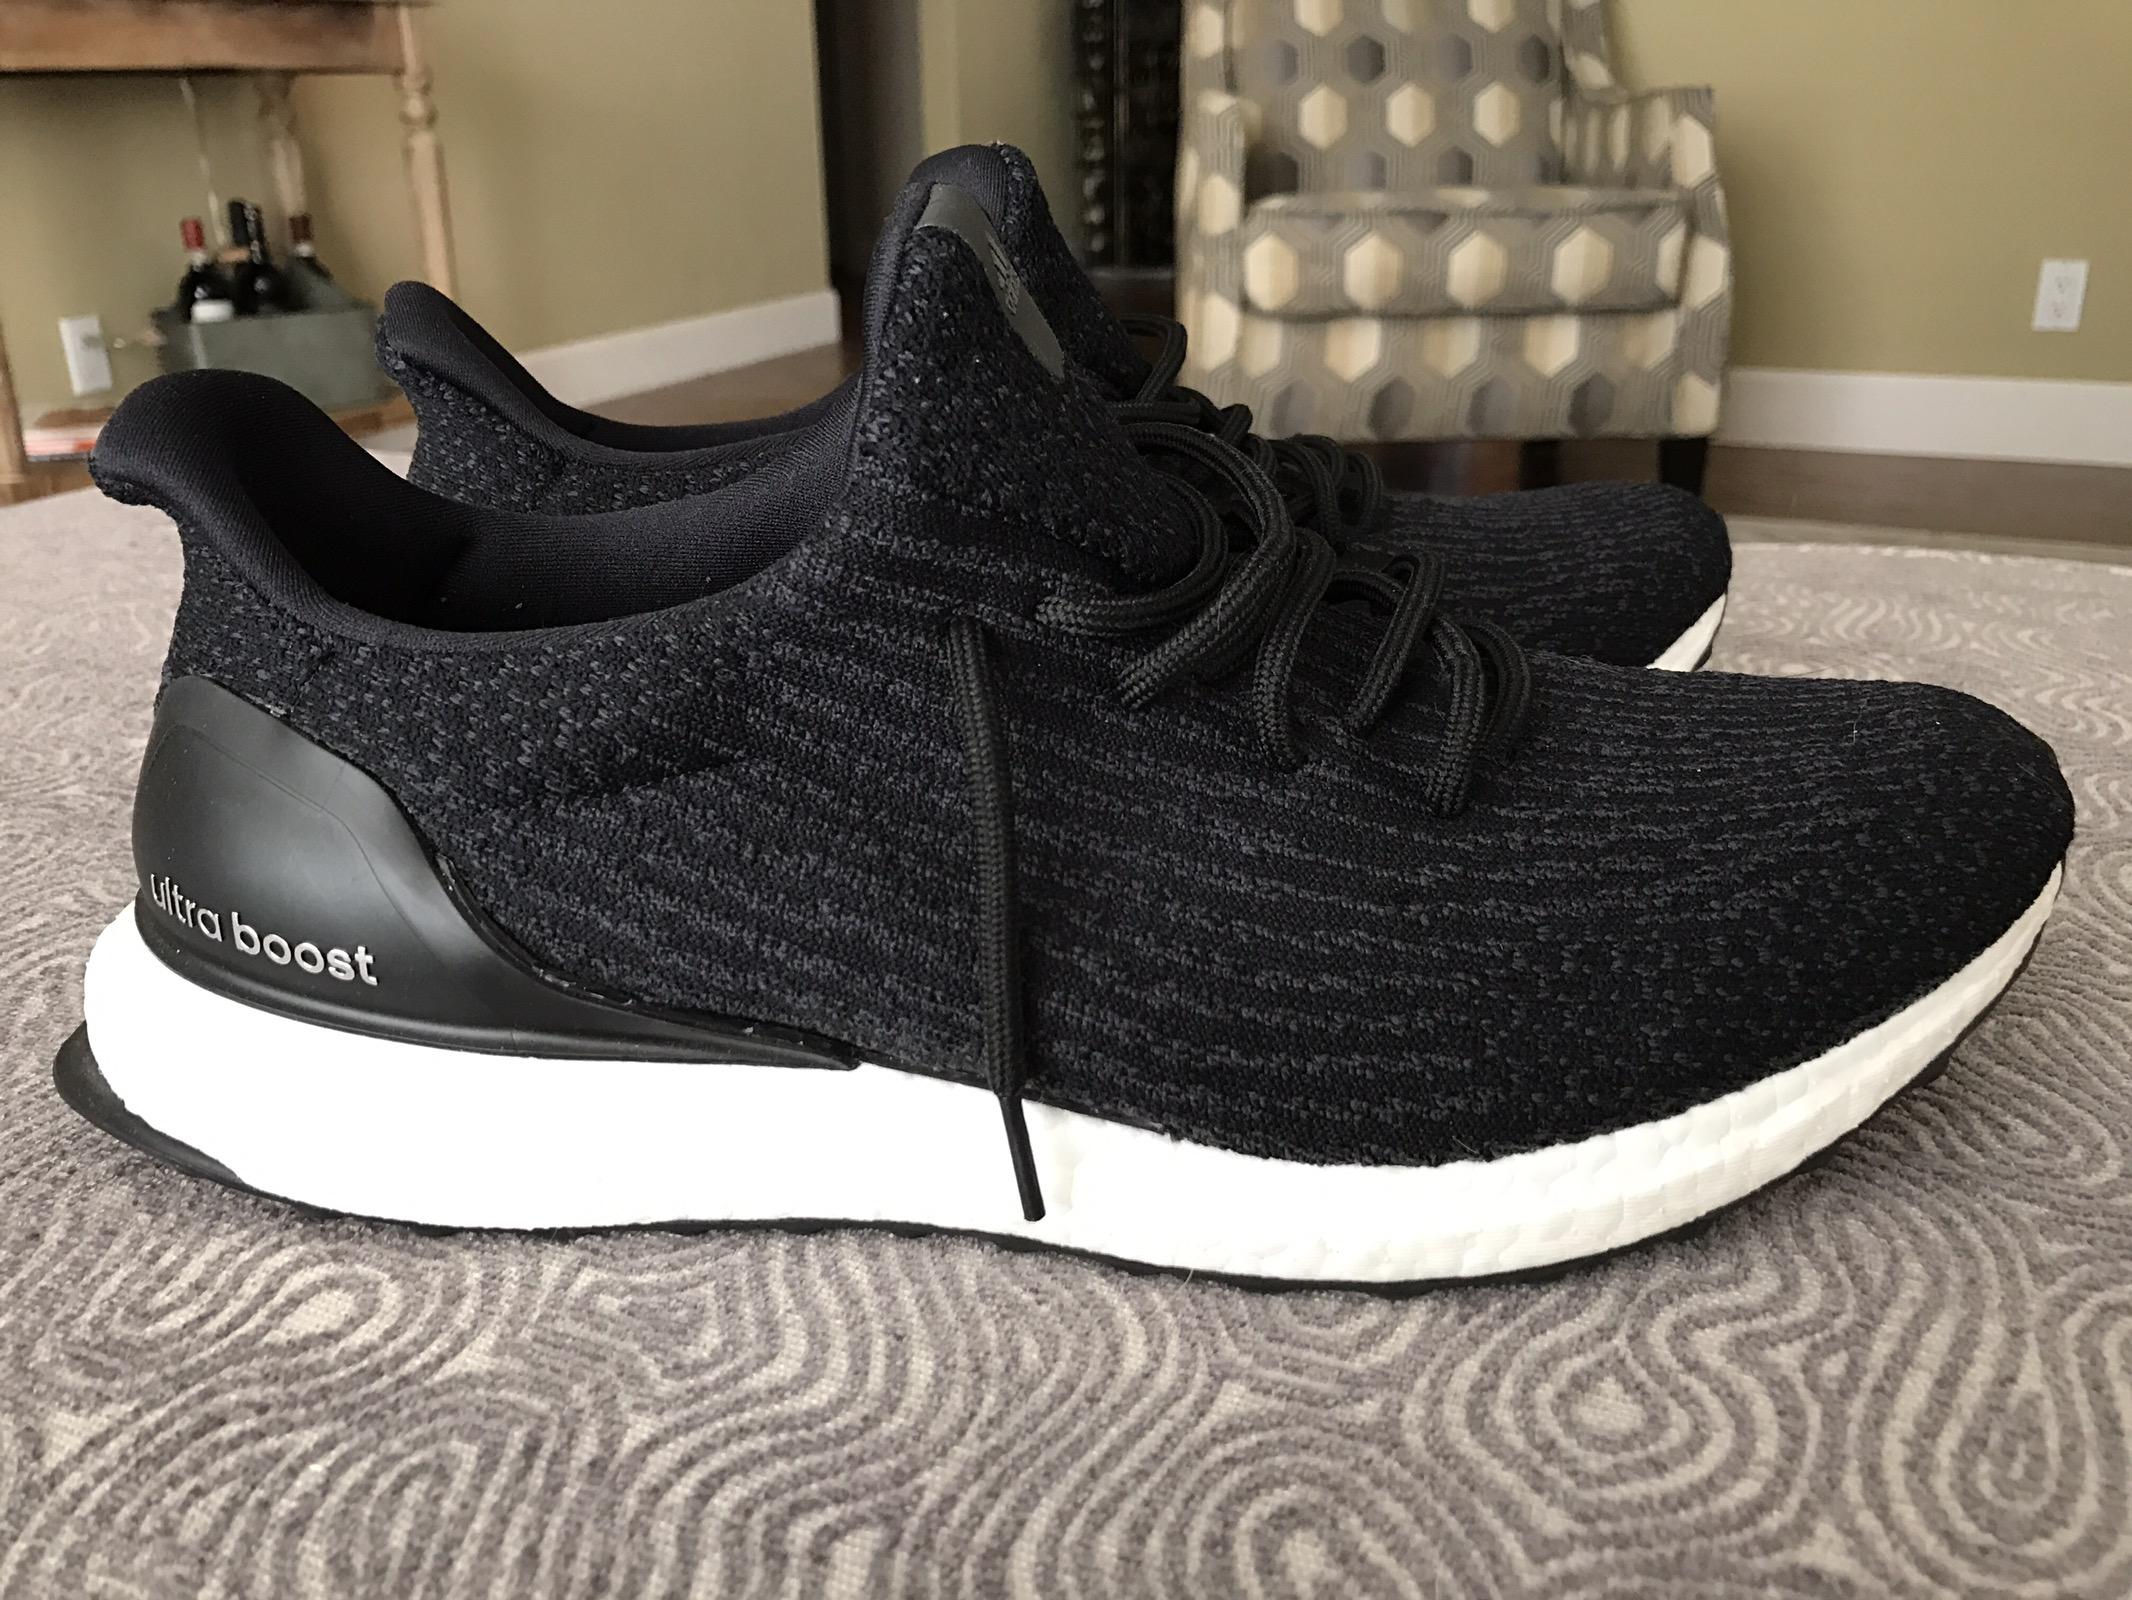 Adidas Ultra Boost 3.0 Core Black Uncaged Custom